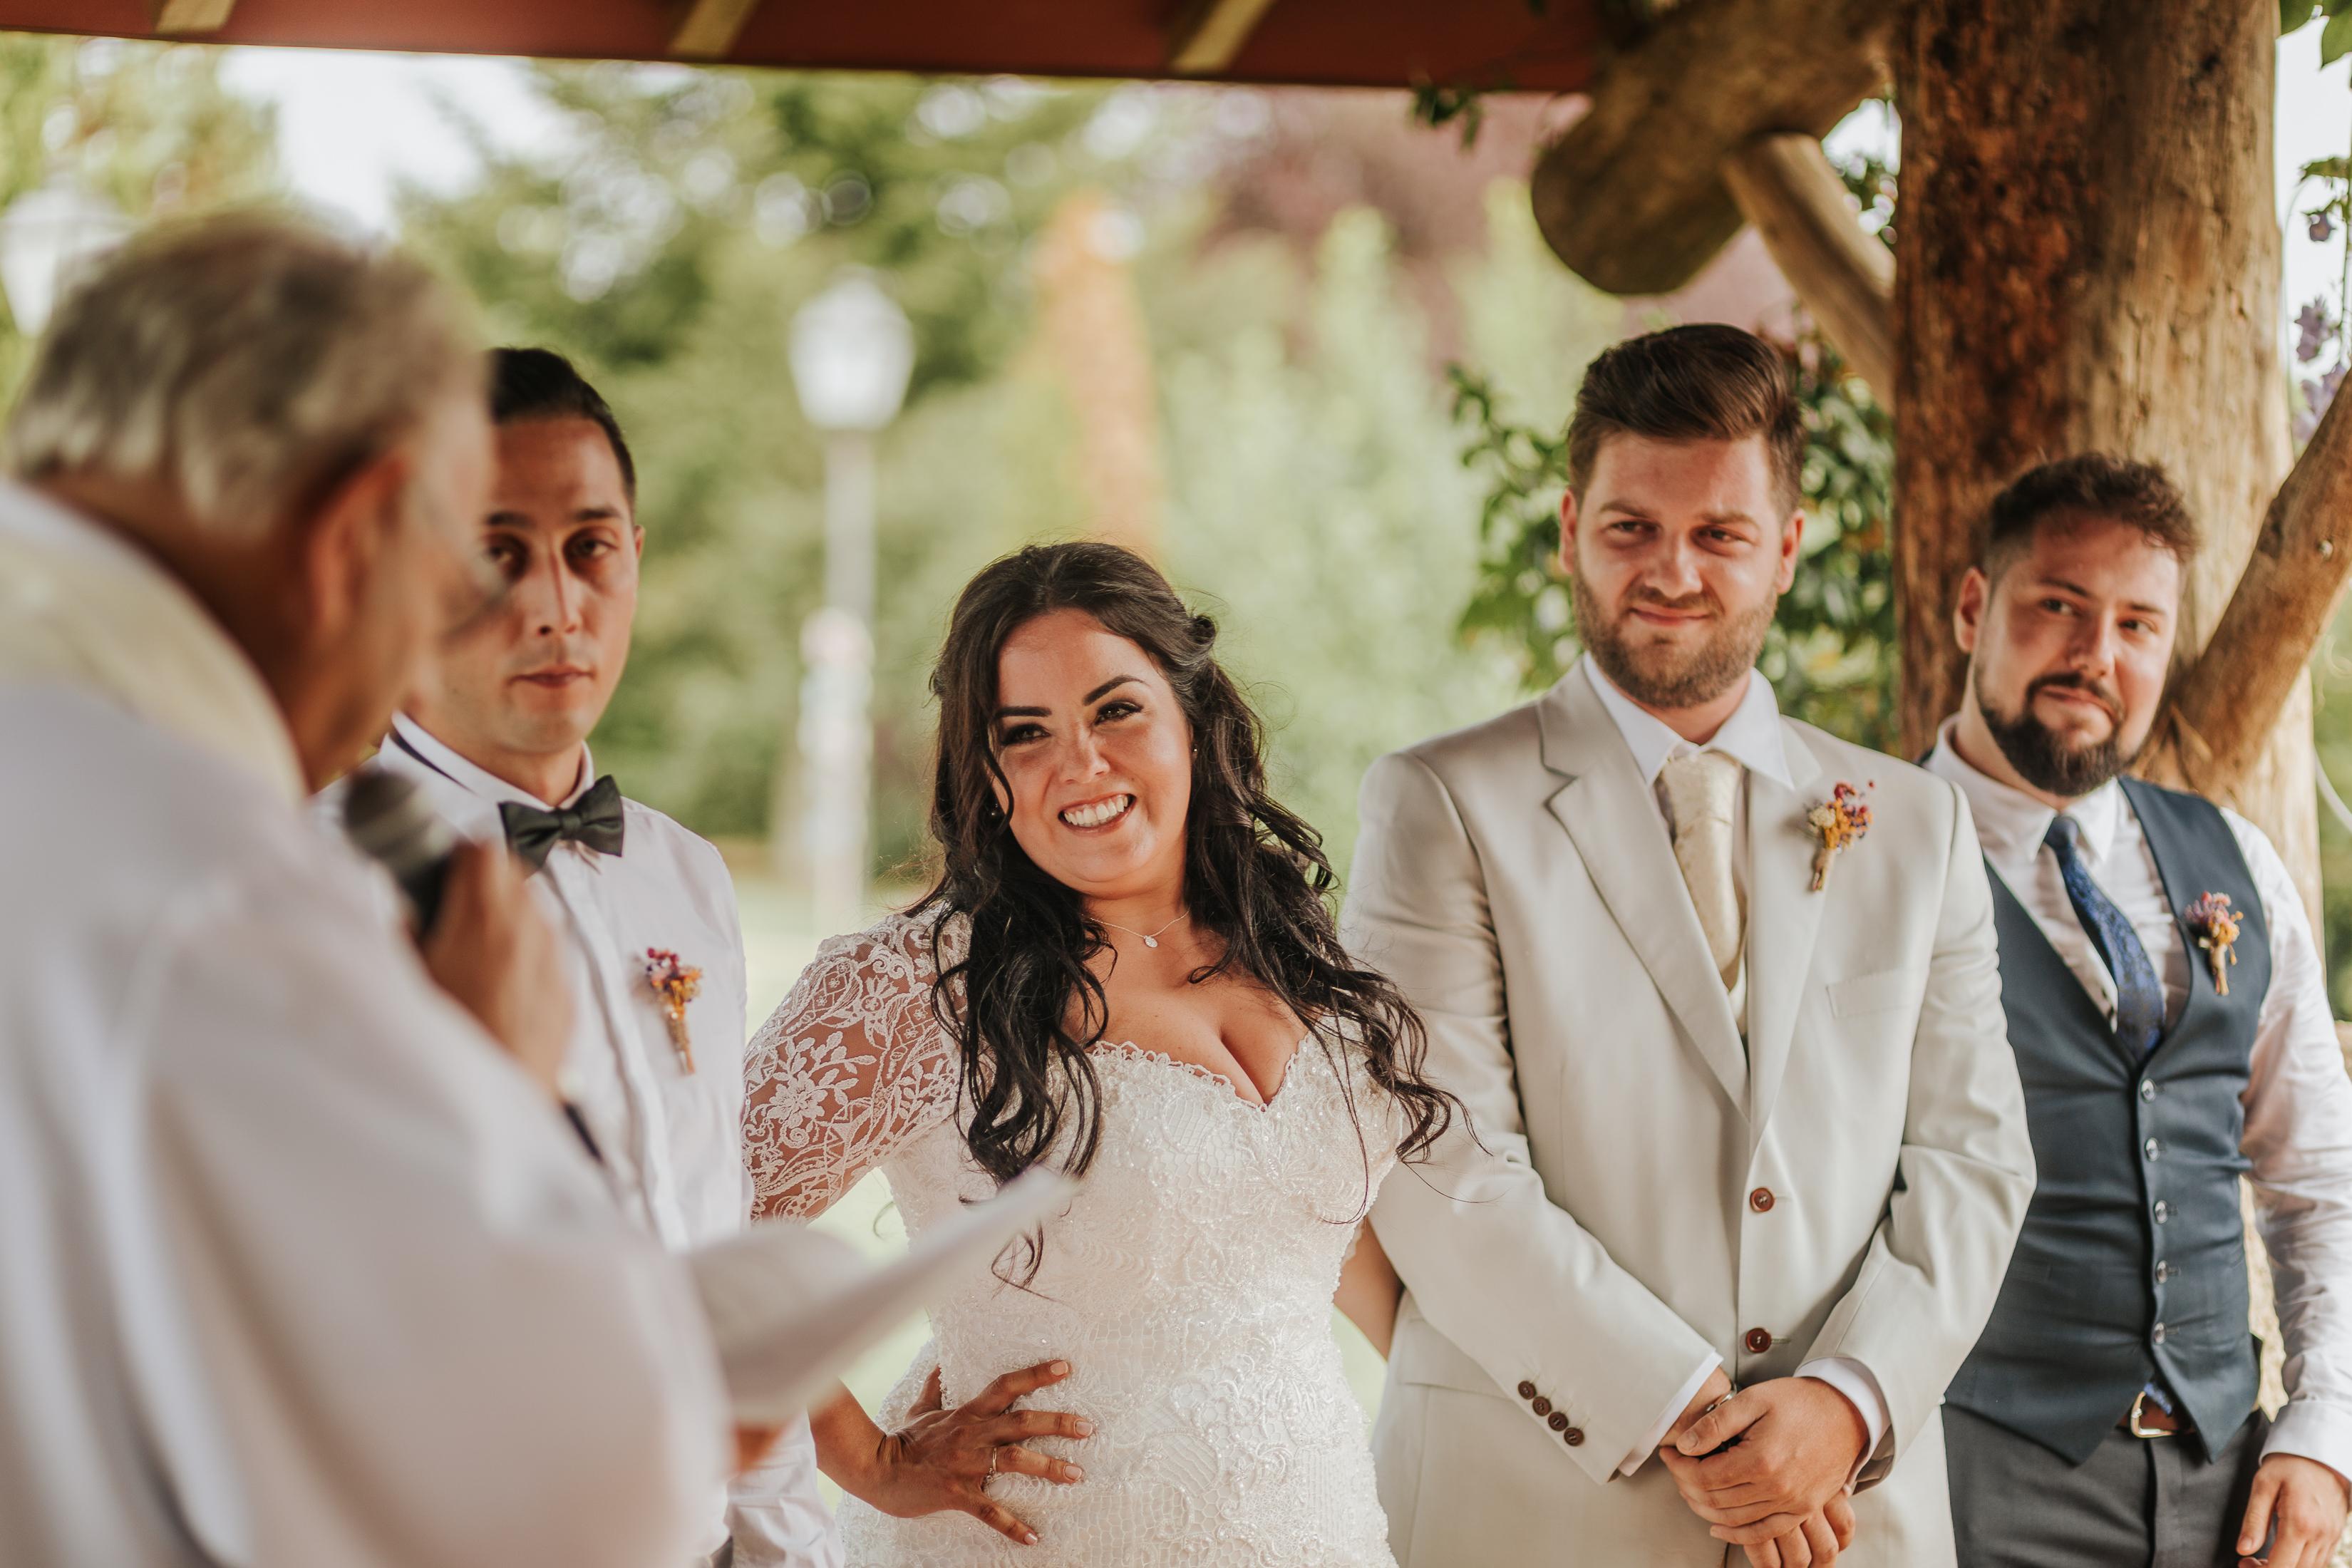 Boda en Masía Brugarolas :: Fotógrafo de bodas Barcelona :: Masia Brugarolas :: Boda en Masía :: Boda en el campo :: Boda sofisticada :: Wedding Photographer